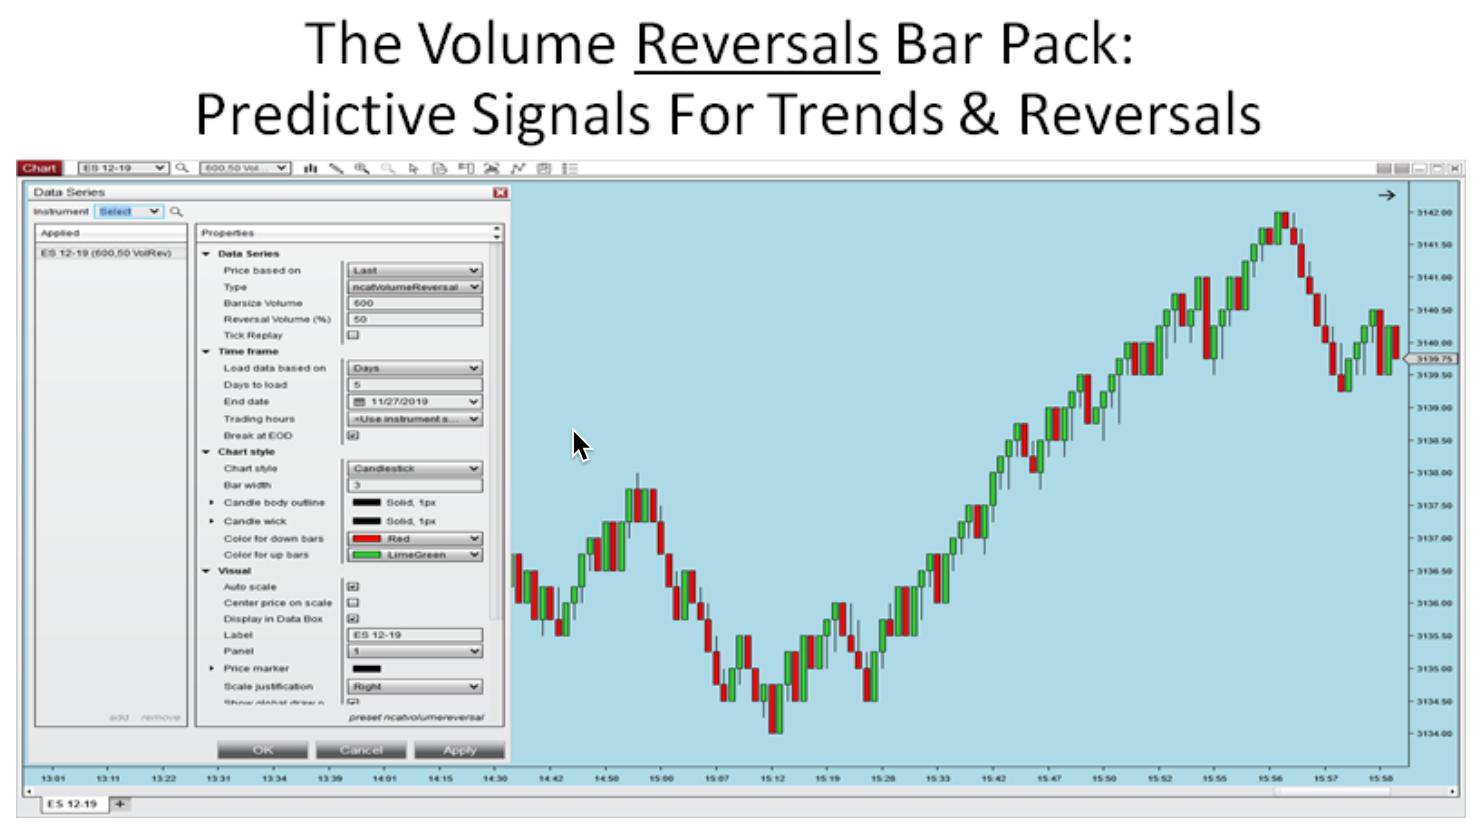 The Volume Reversals Bar pack